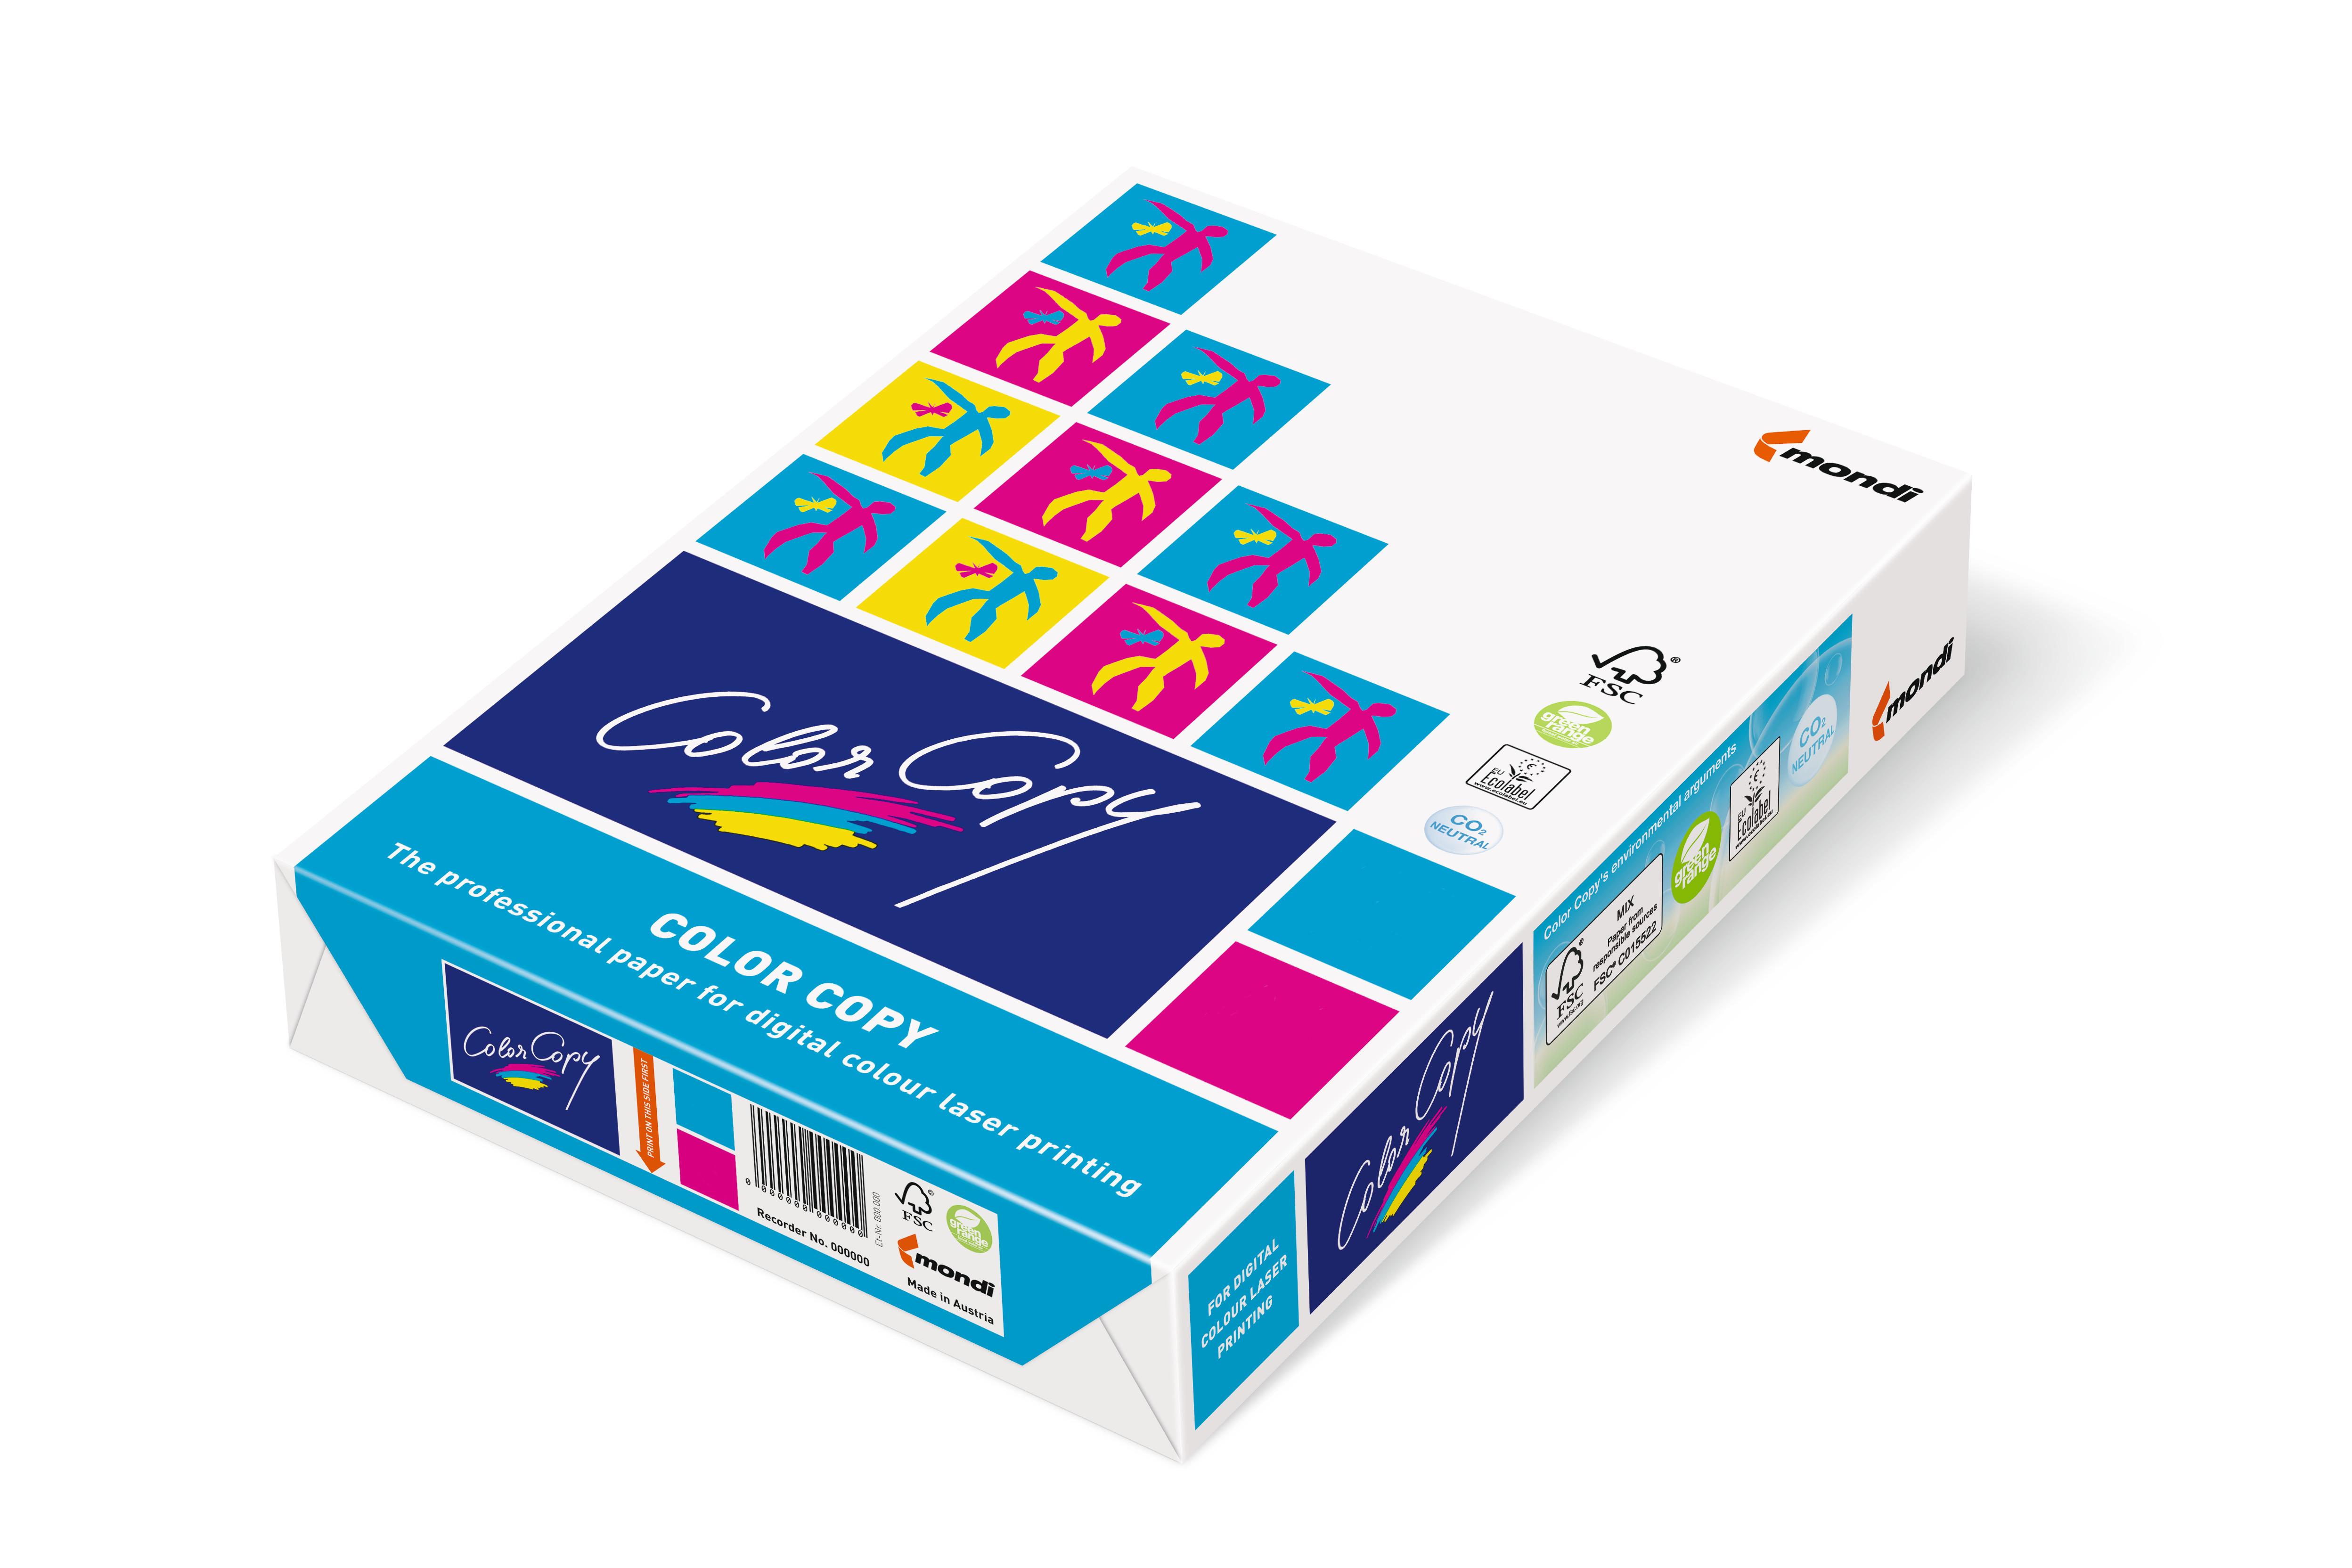 Vorschau: Mondi Color Copy 220 g/m² DIN-SRA3 250 Blatt